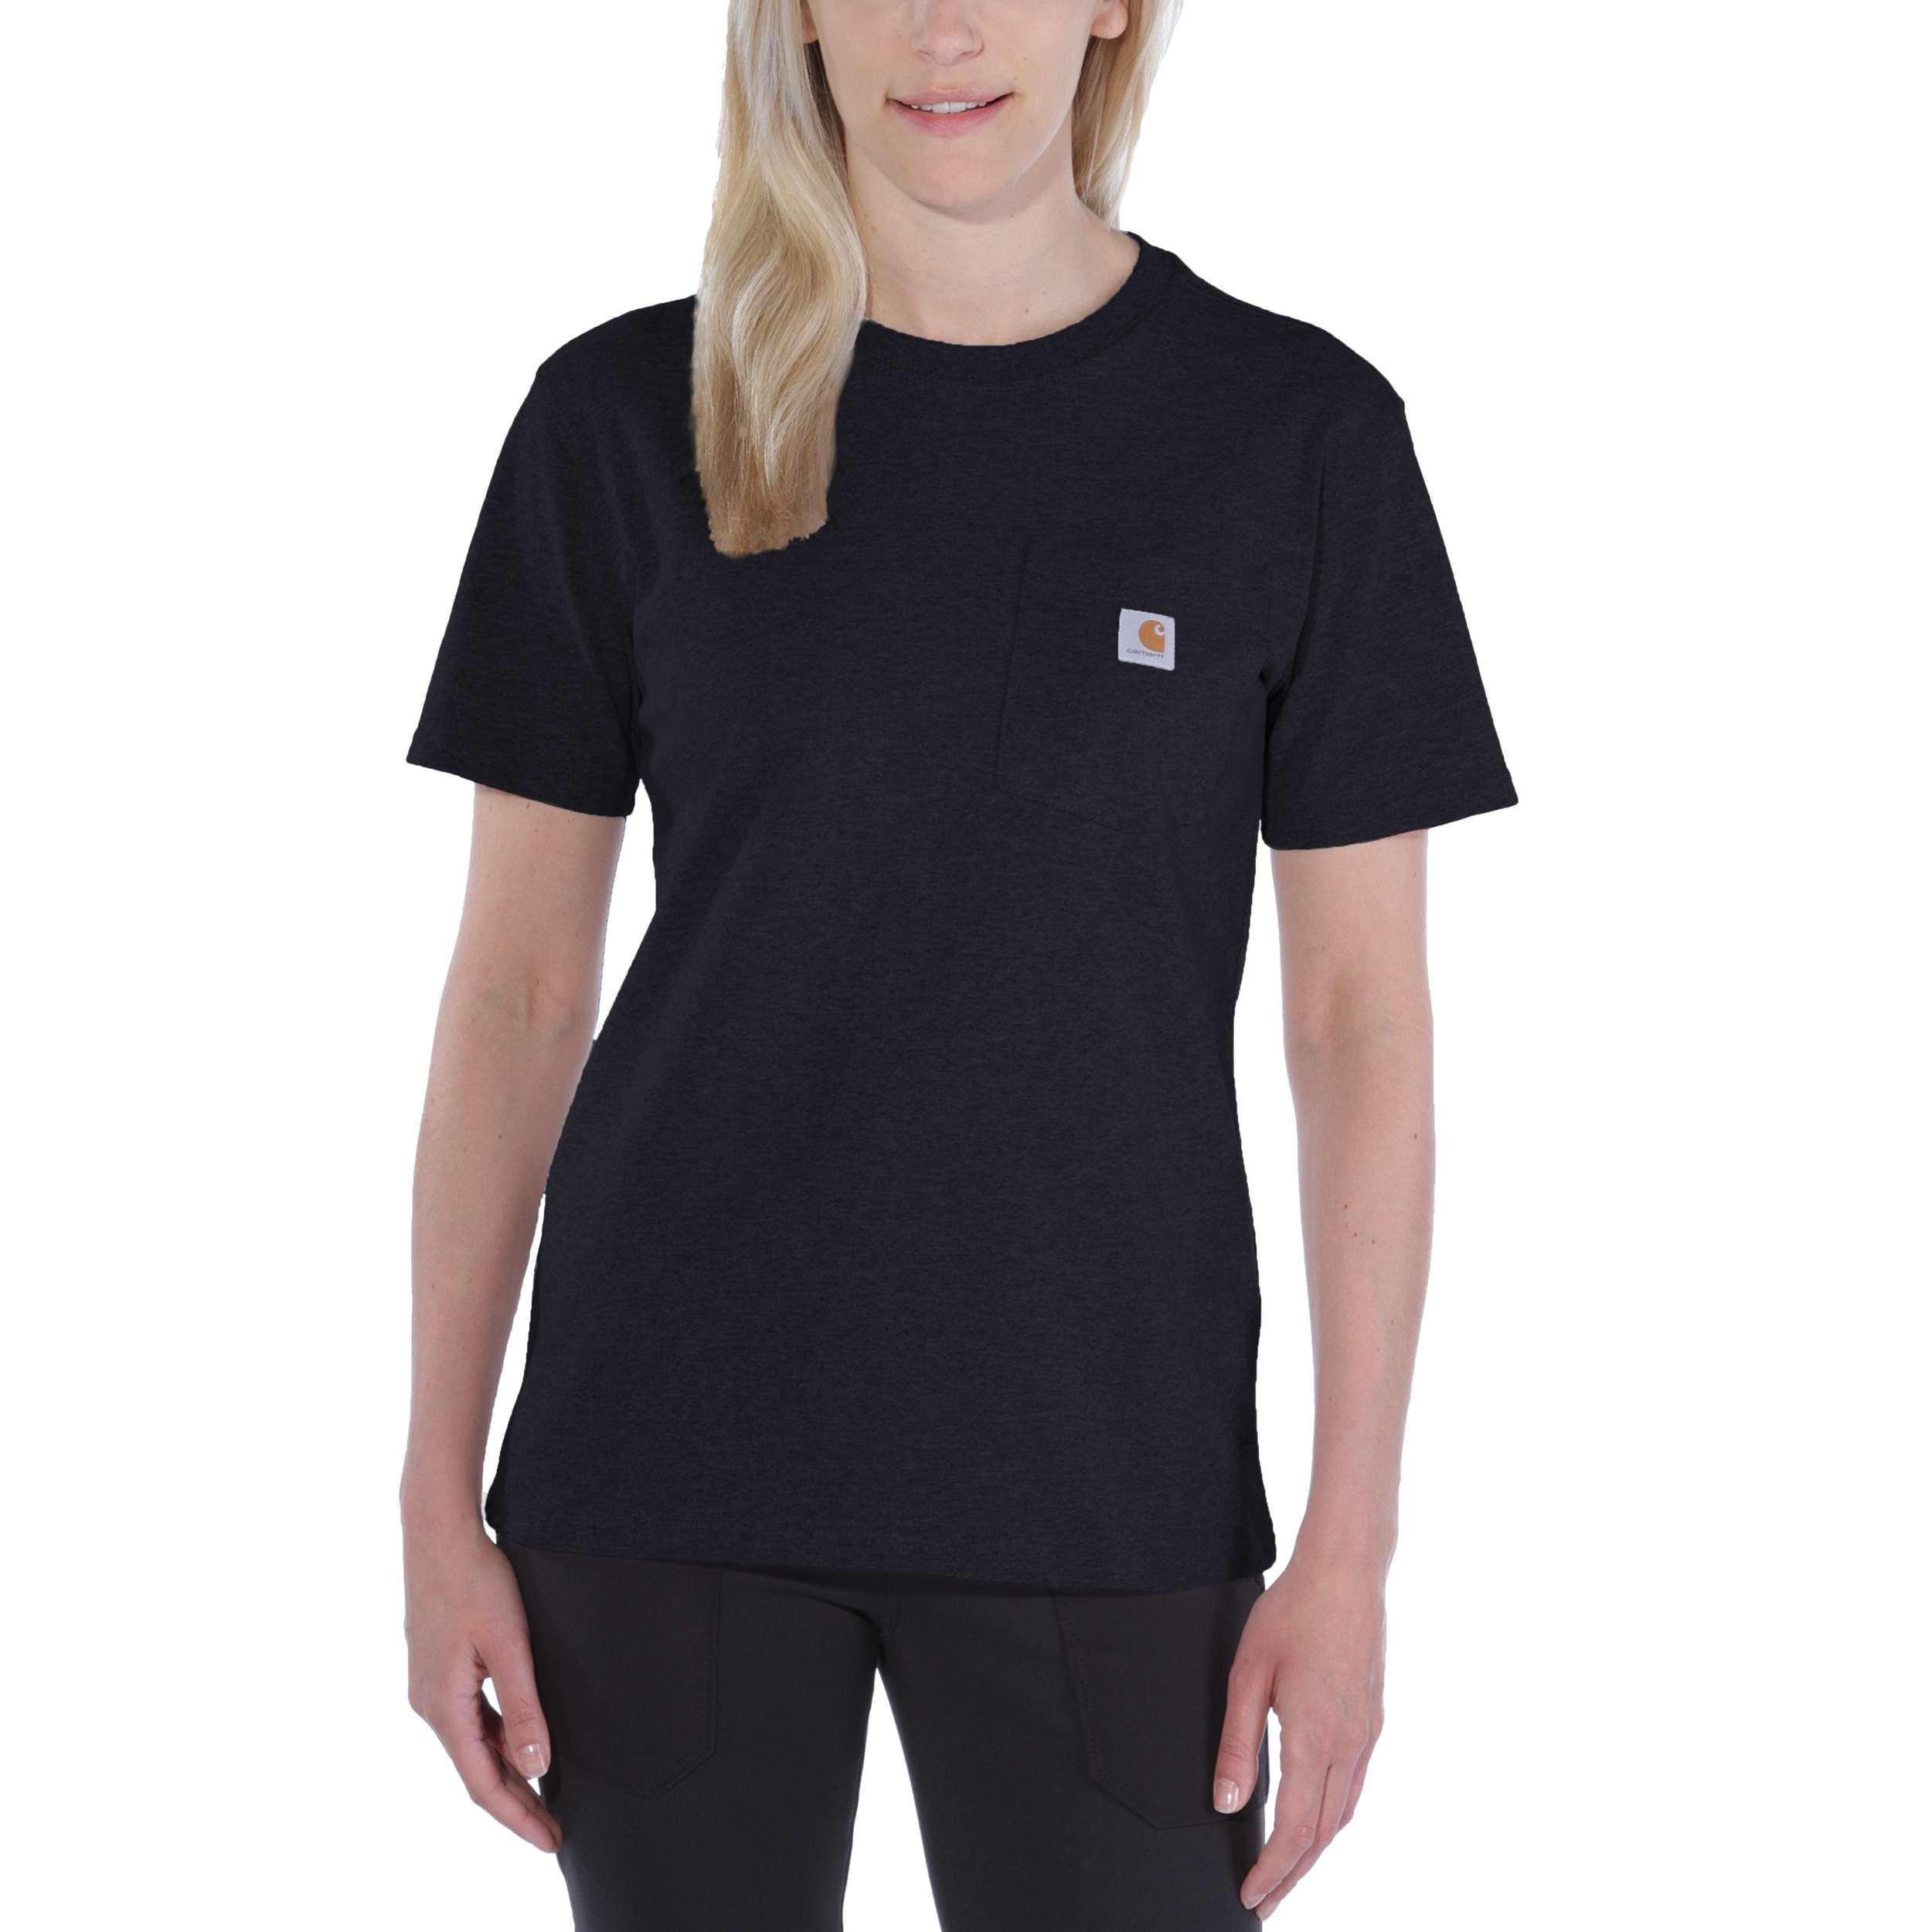 Футболка женская Carhartt WK87 Workwear Pocket T-Shirt - 103067 (Black, S)